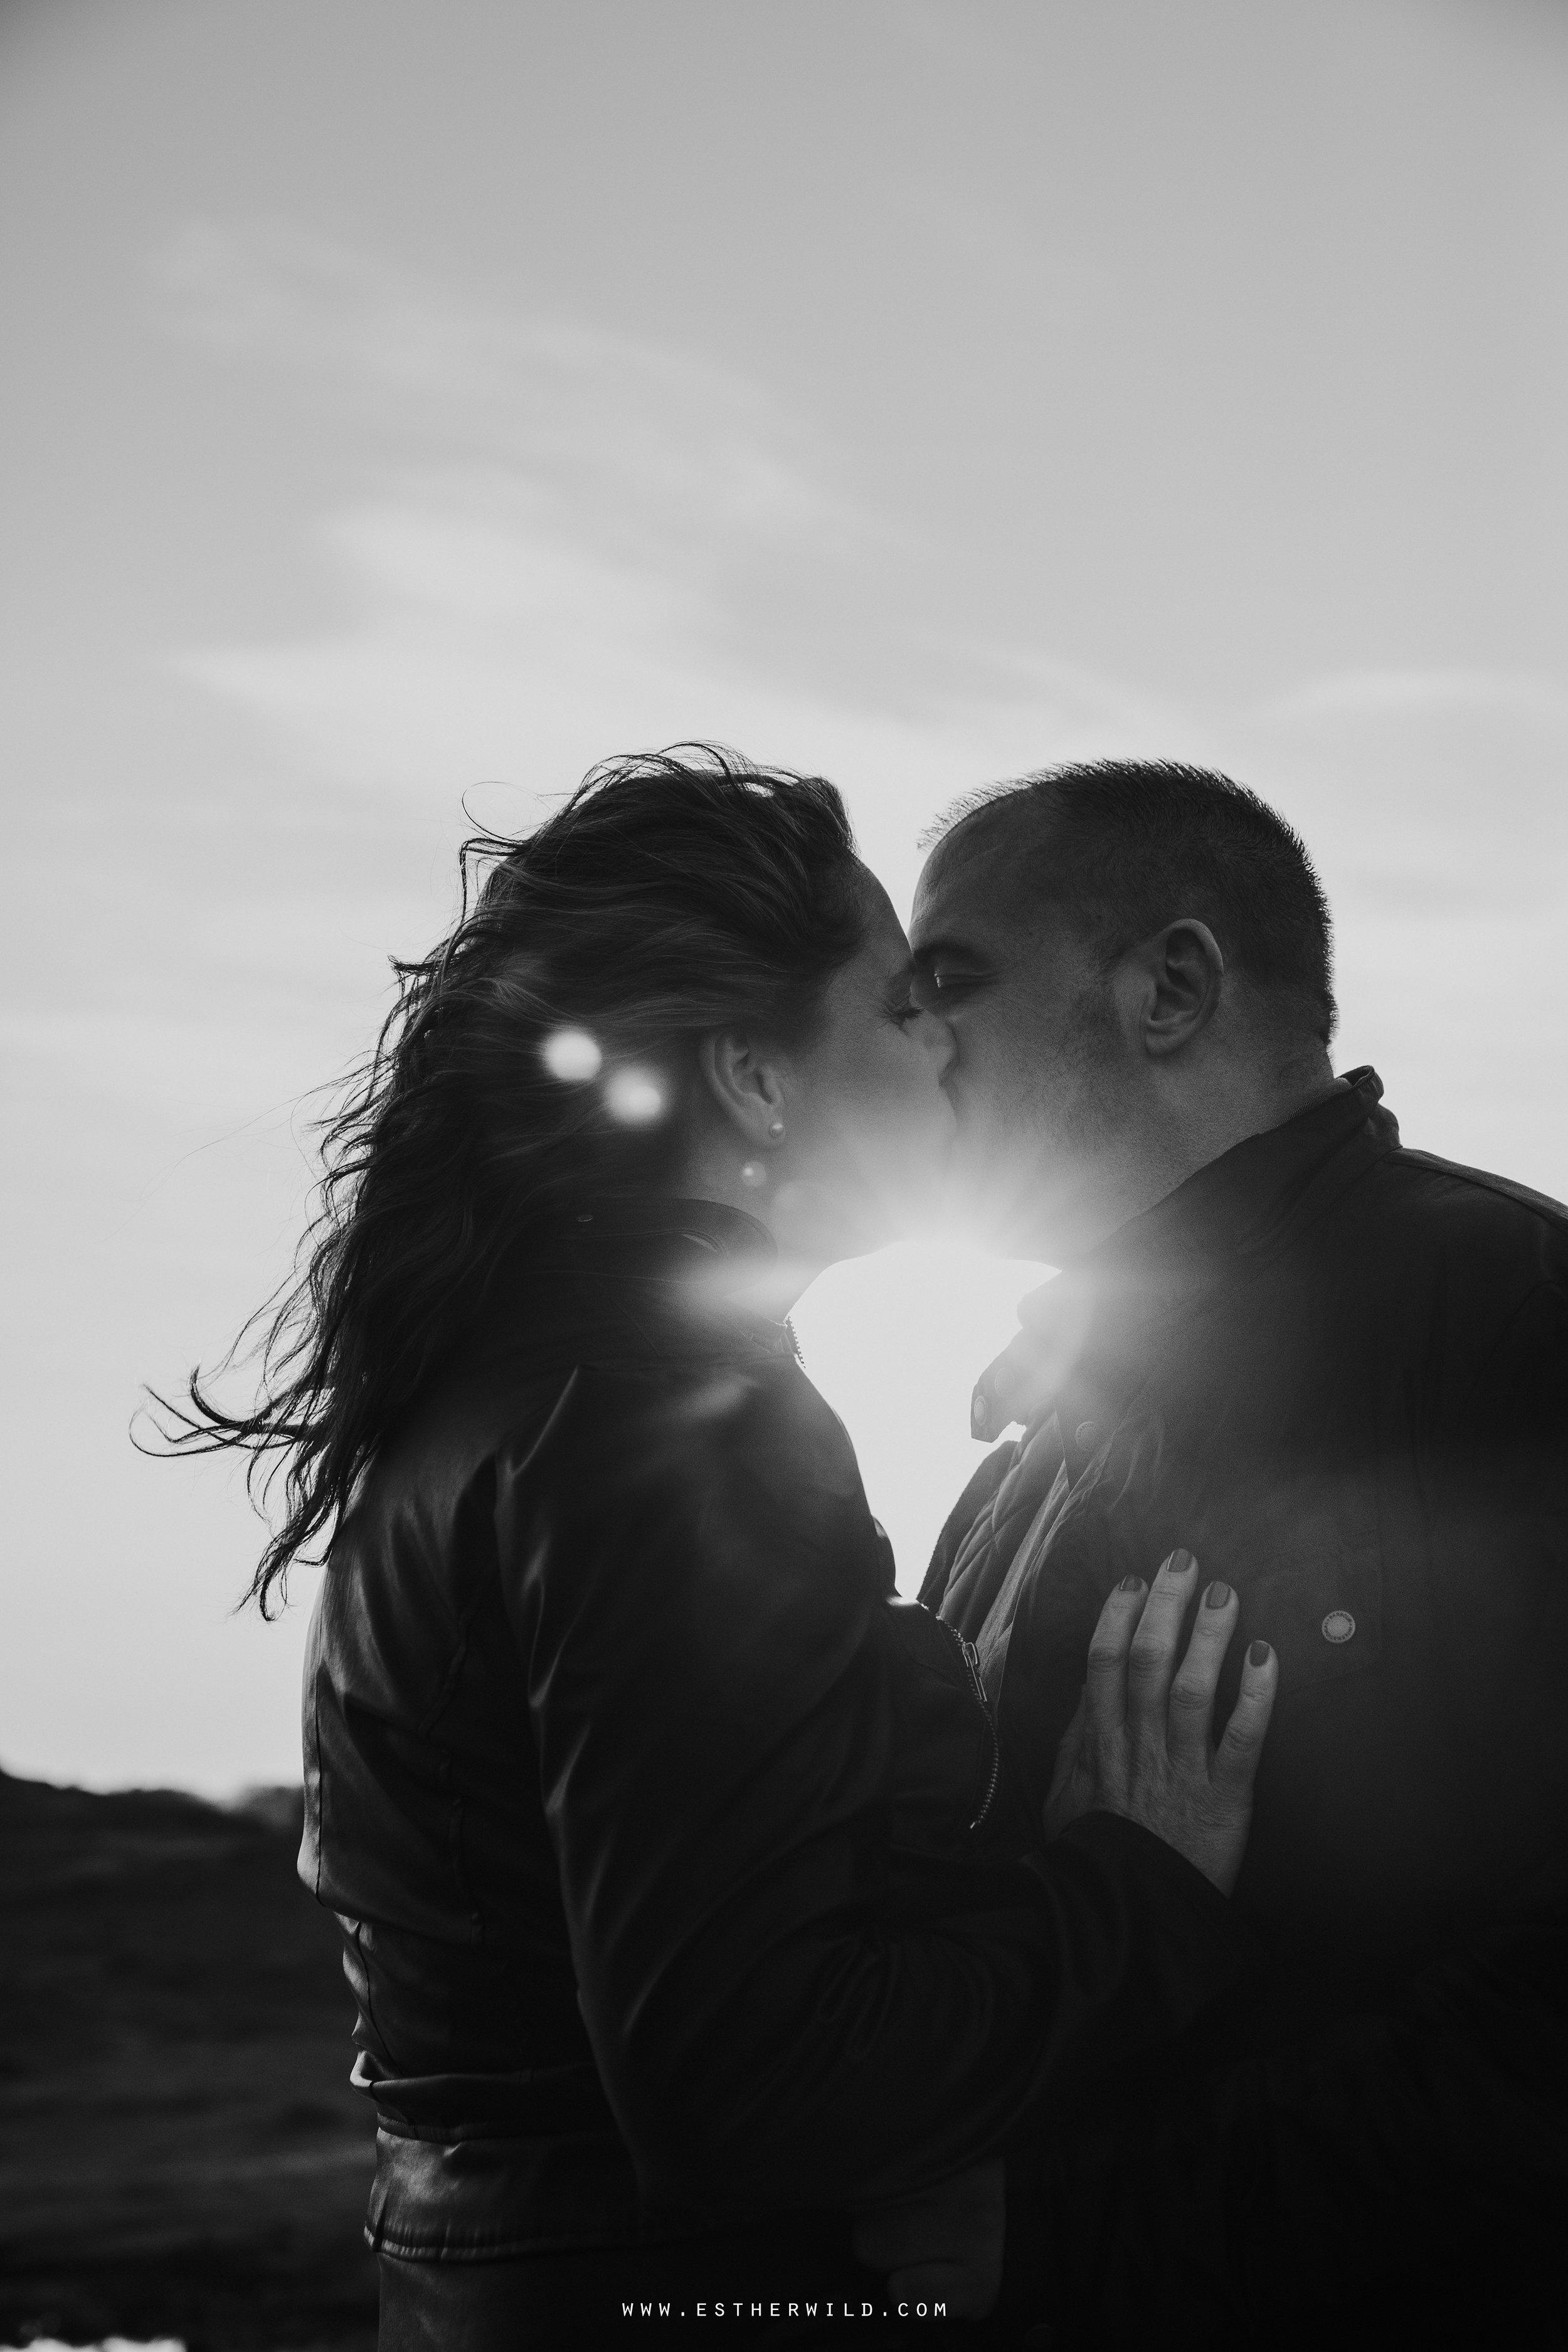 Cumbria_Lake_District_Wasdale_Wedding_Photographer_Destination_Engagement_Anniversary_Esther_Wild_IMG_4679.jpg